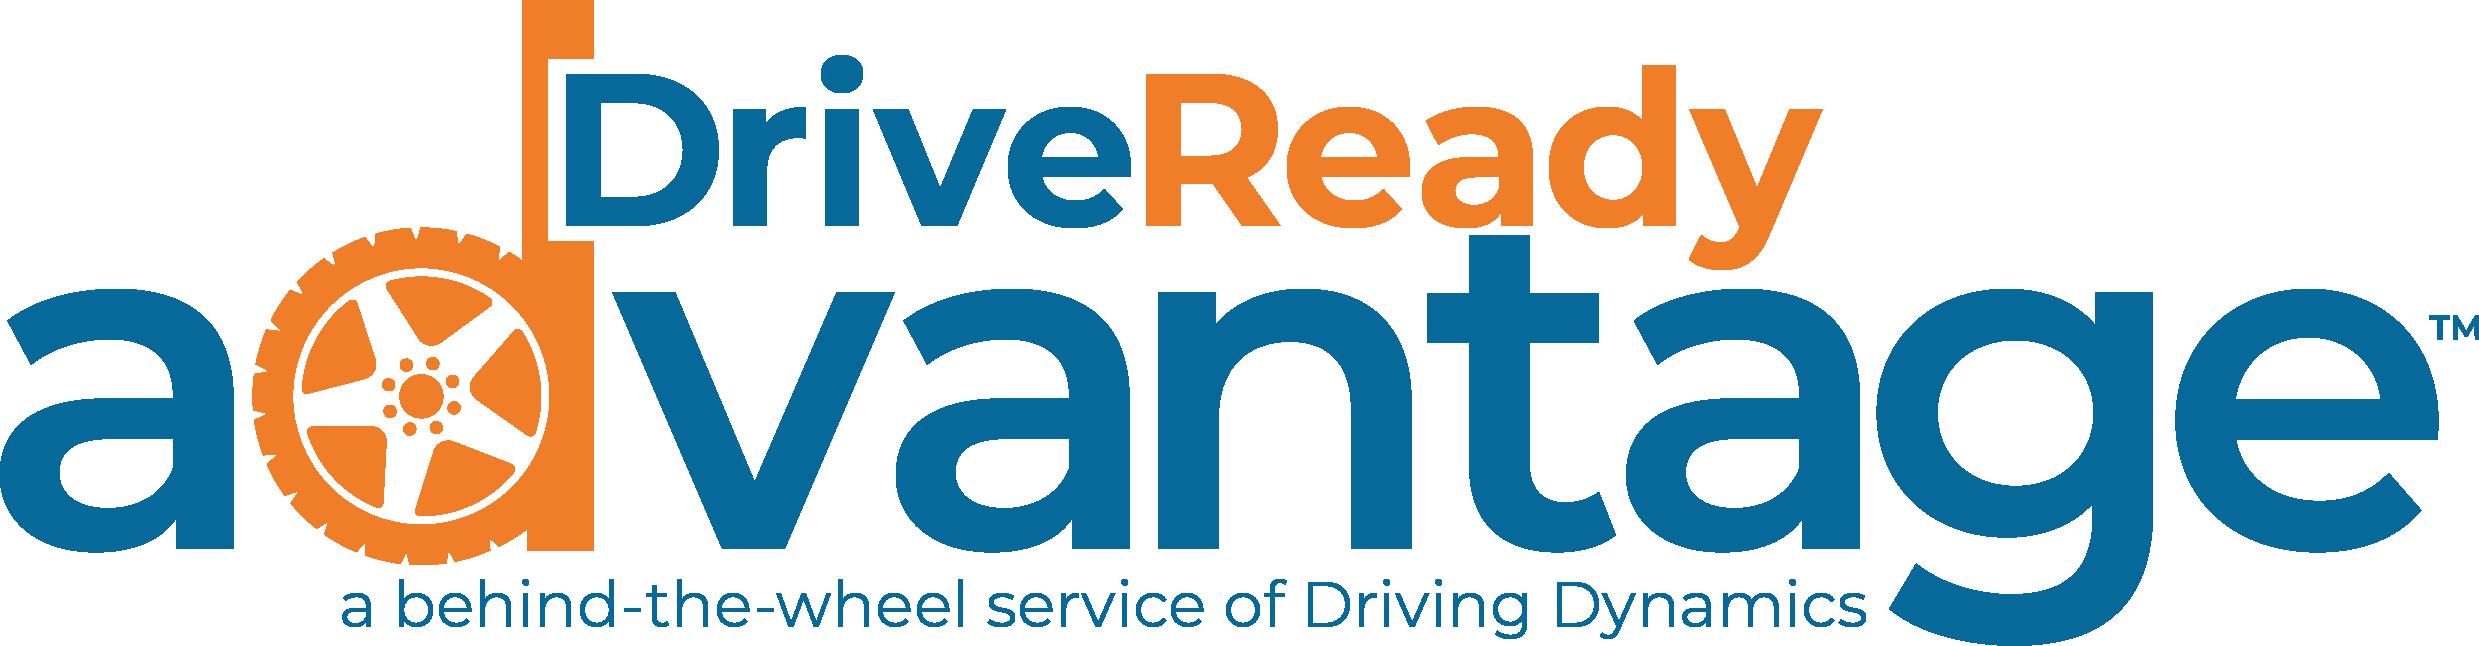 DriveReady Advantage™ Open Enrollment